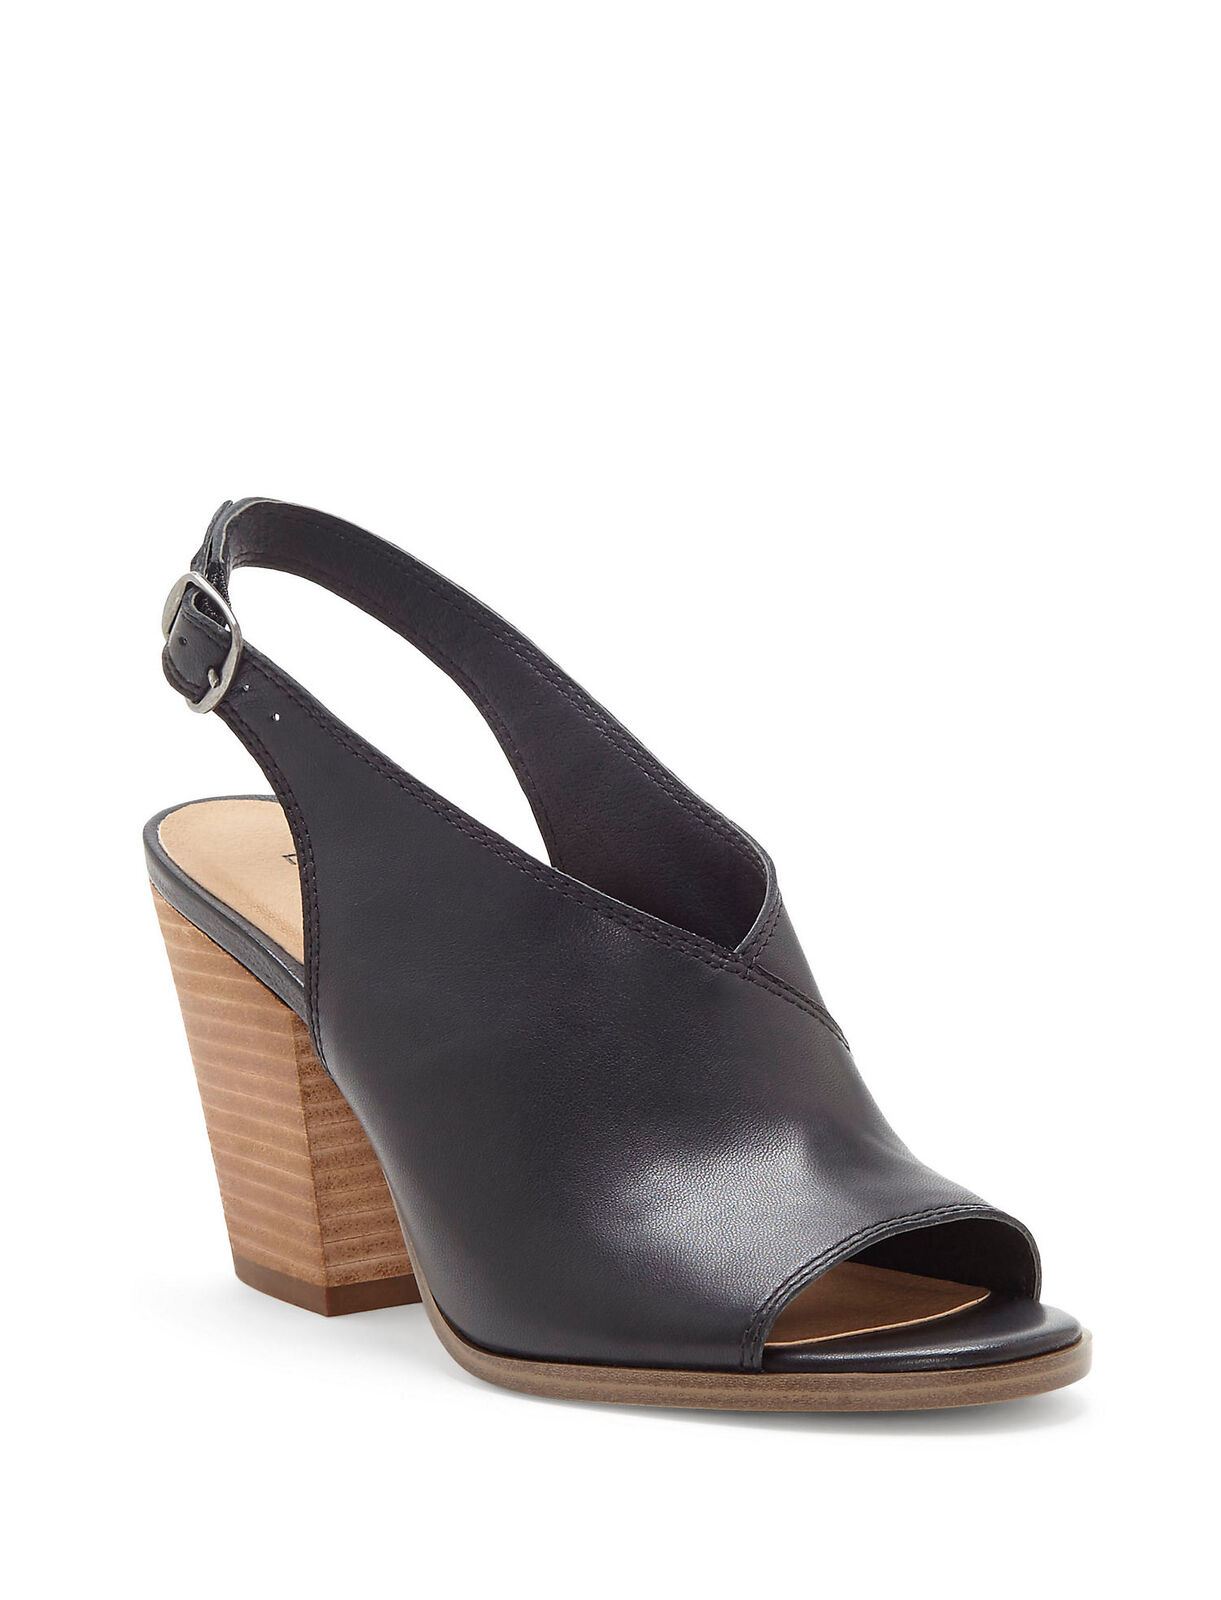 al prezzo più basso Lucky Brand donna Ovrandie Ovrandie Ovrandie Slingback Peep Toe Heel  fino al 60% di sconto